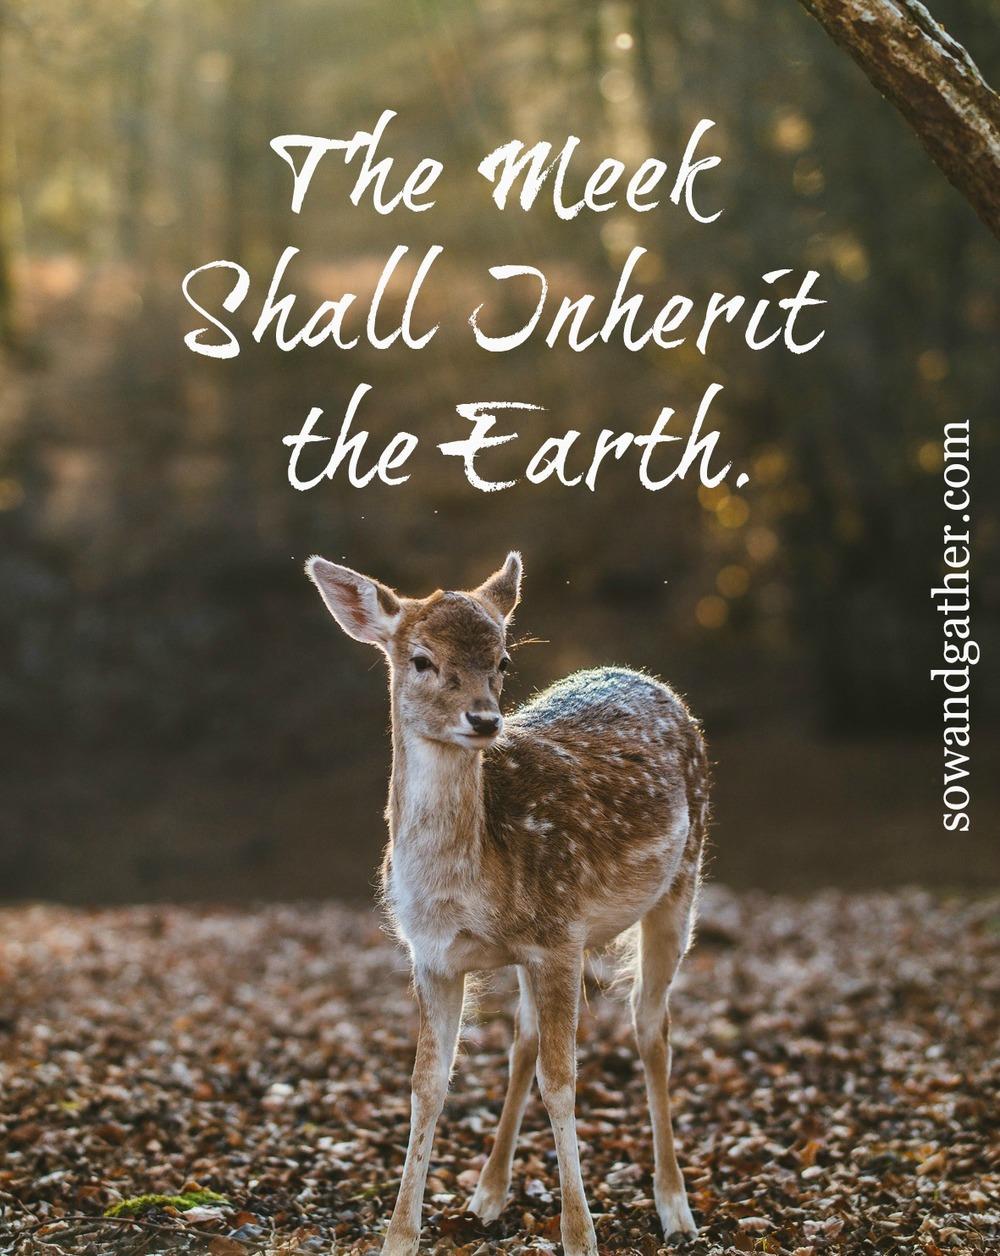 The Meek Shall Inherit The Earth #sowandgather sowandgather.com